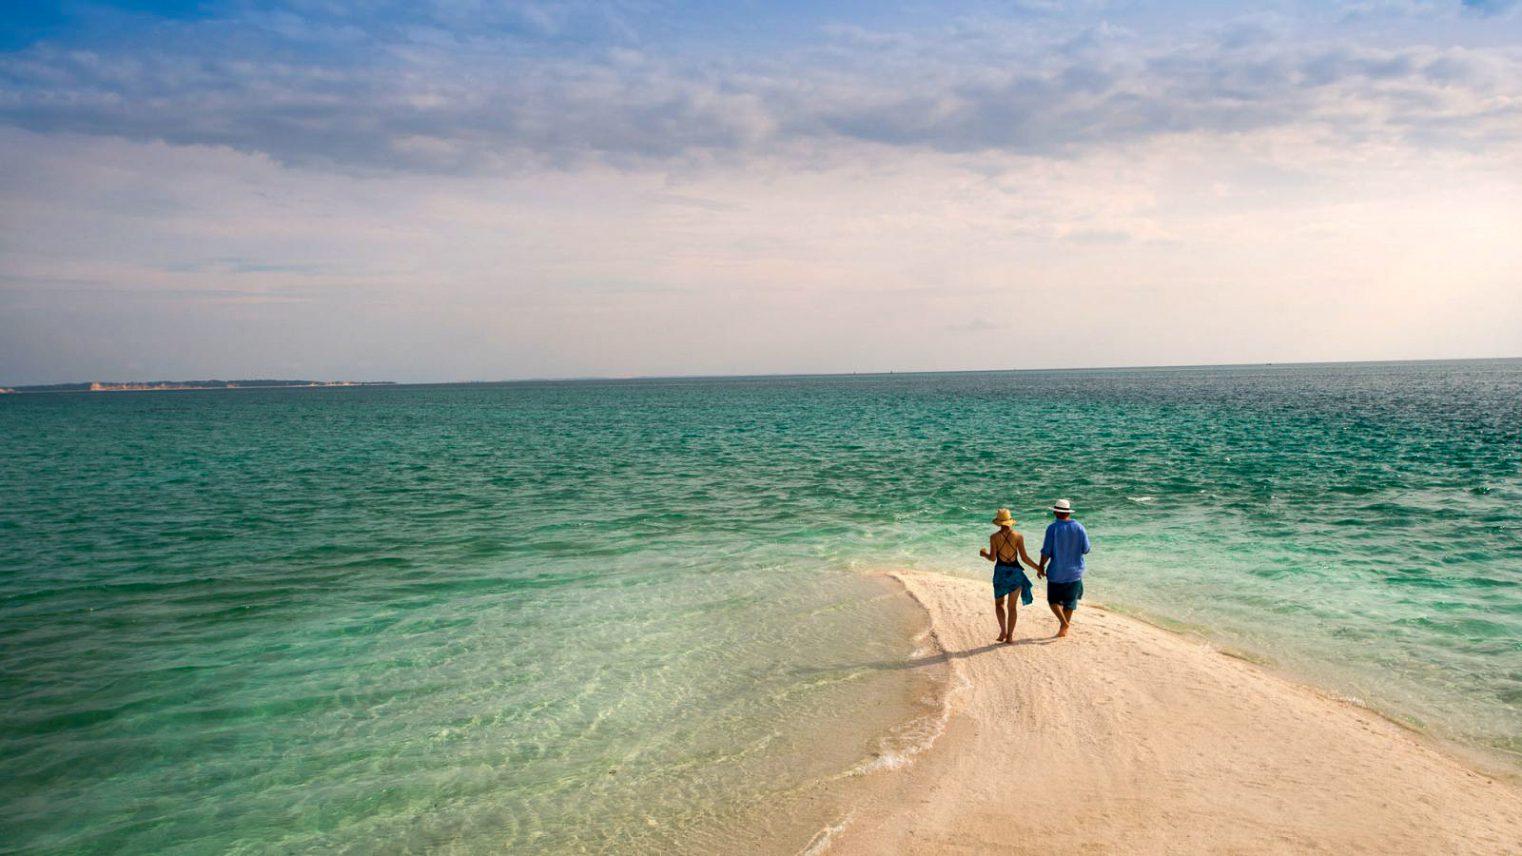 Туры на Мозамбик, отдых на Мозамбике, туры на Bazaruto, лучшие отели Мозамбика, виллы на Мозамбике